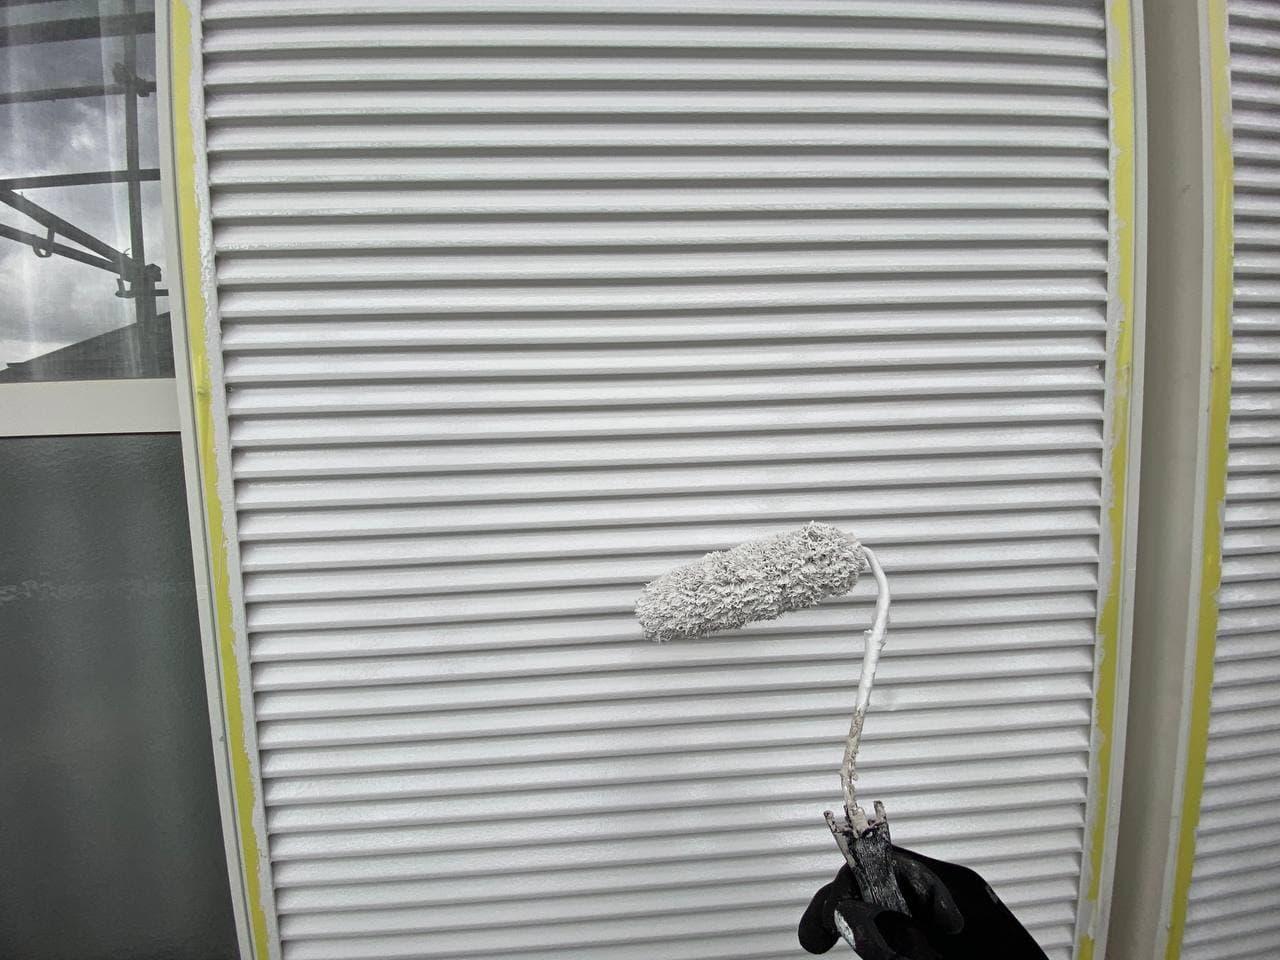 東京都渋谷区にて屋根外壁塗装工事